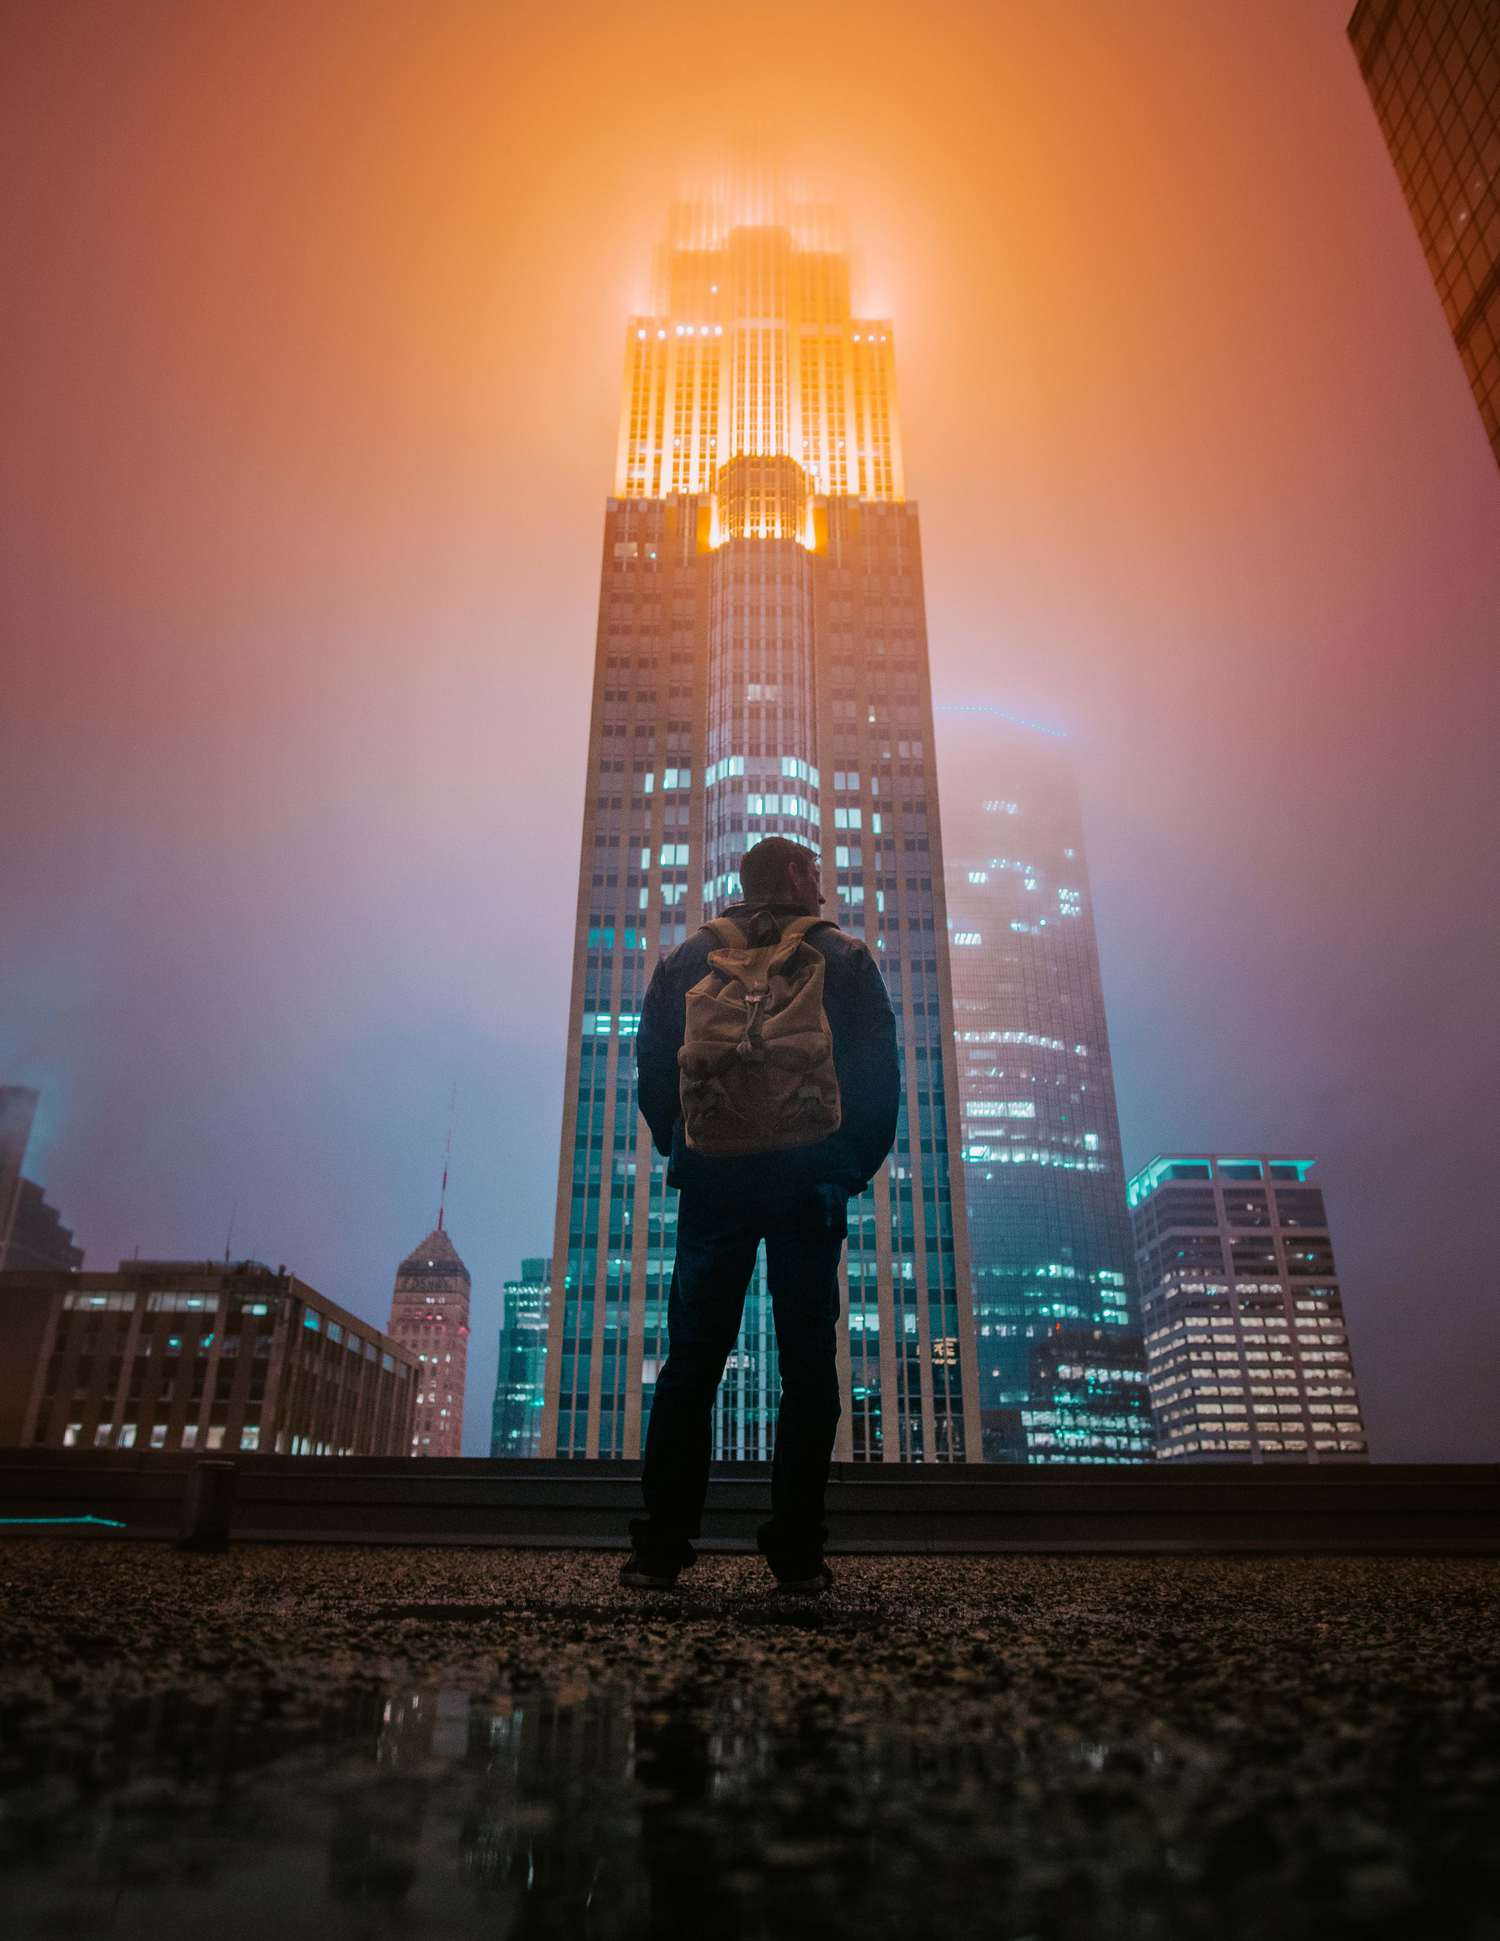 figura humana delante de rascacielos con luces encendidas